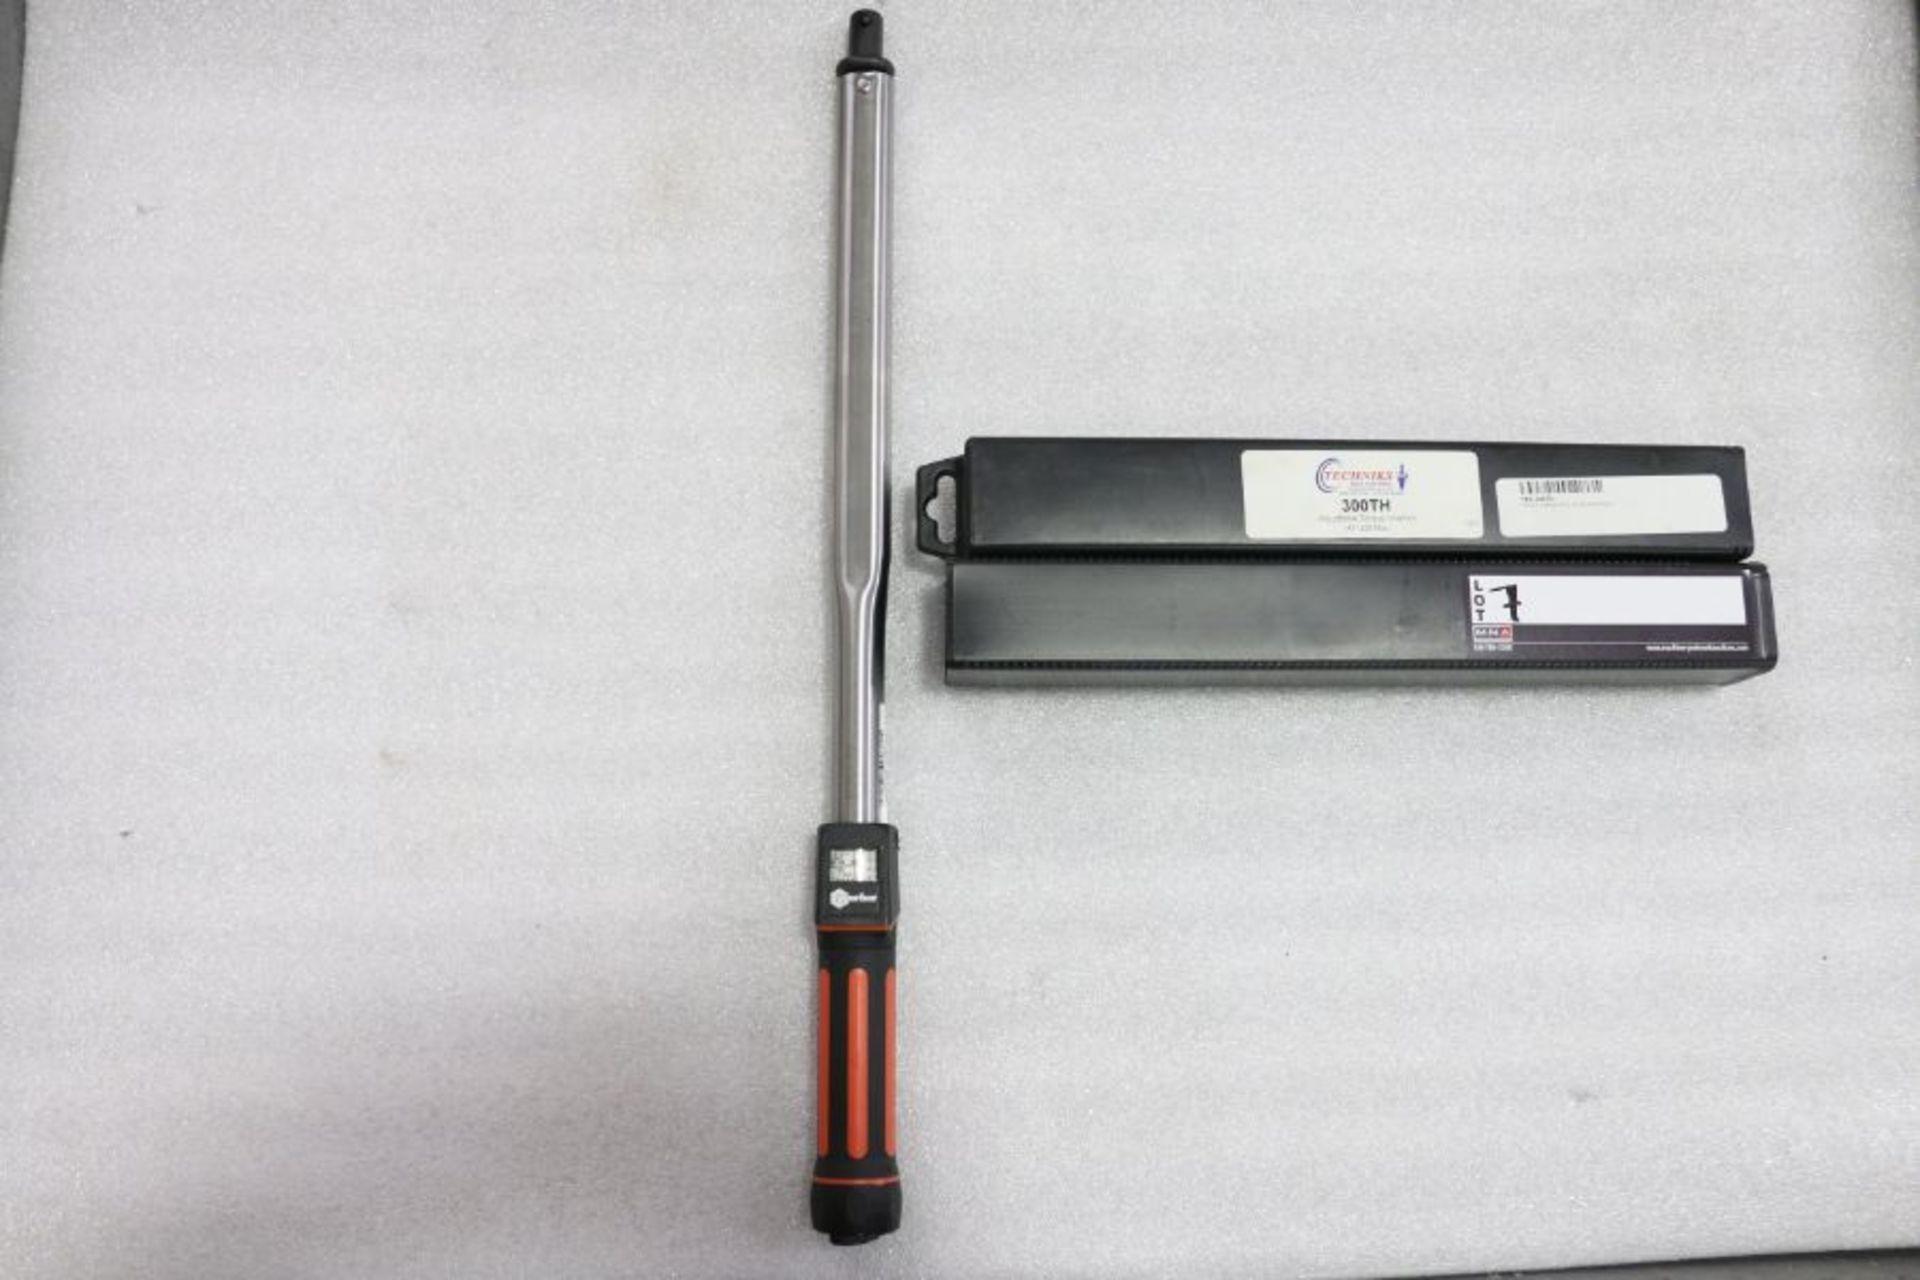 Lot 7 - Techniks 300TH Adjustable Torque Wrench